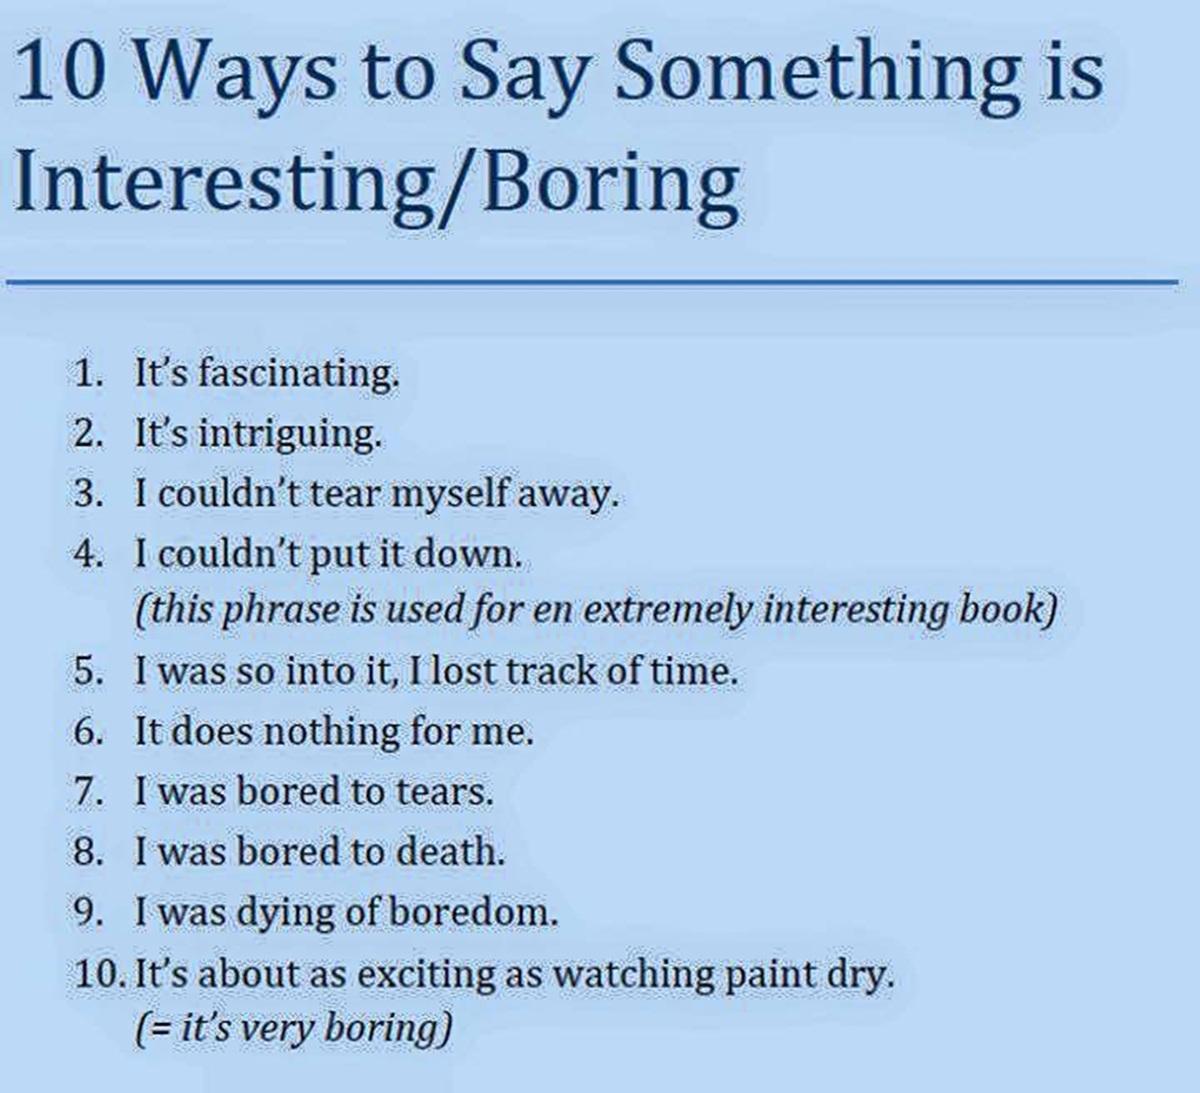 10 Ways to Say Something is Interesting/ Boring 3